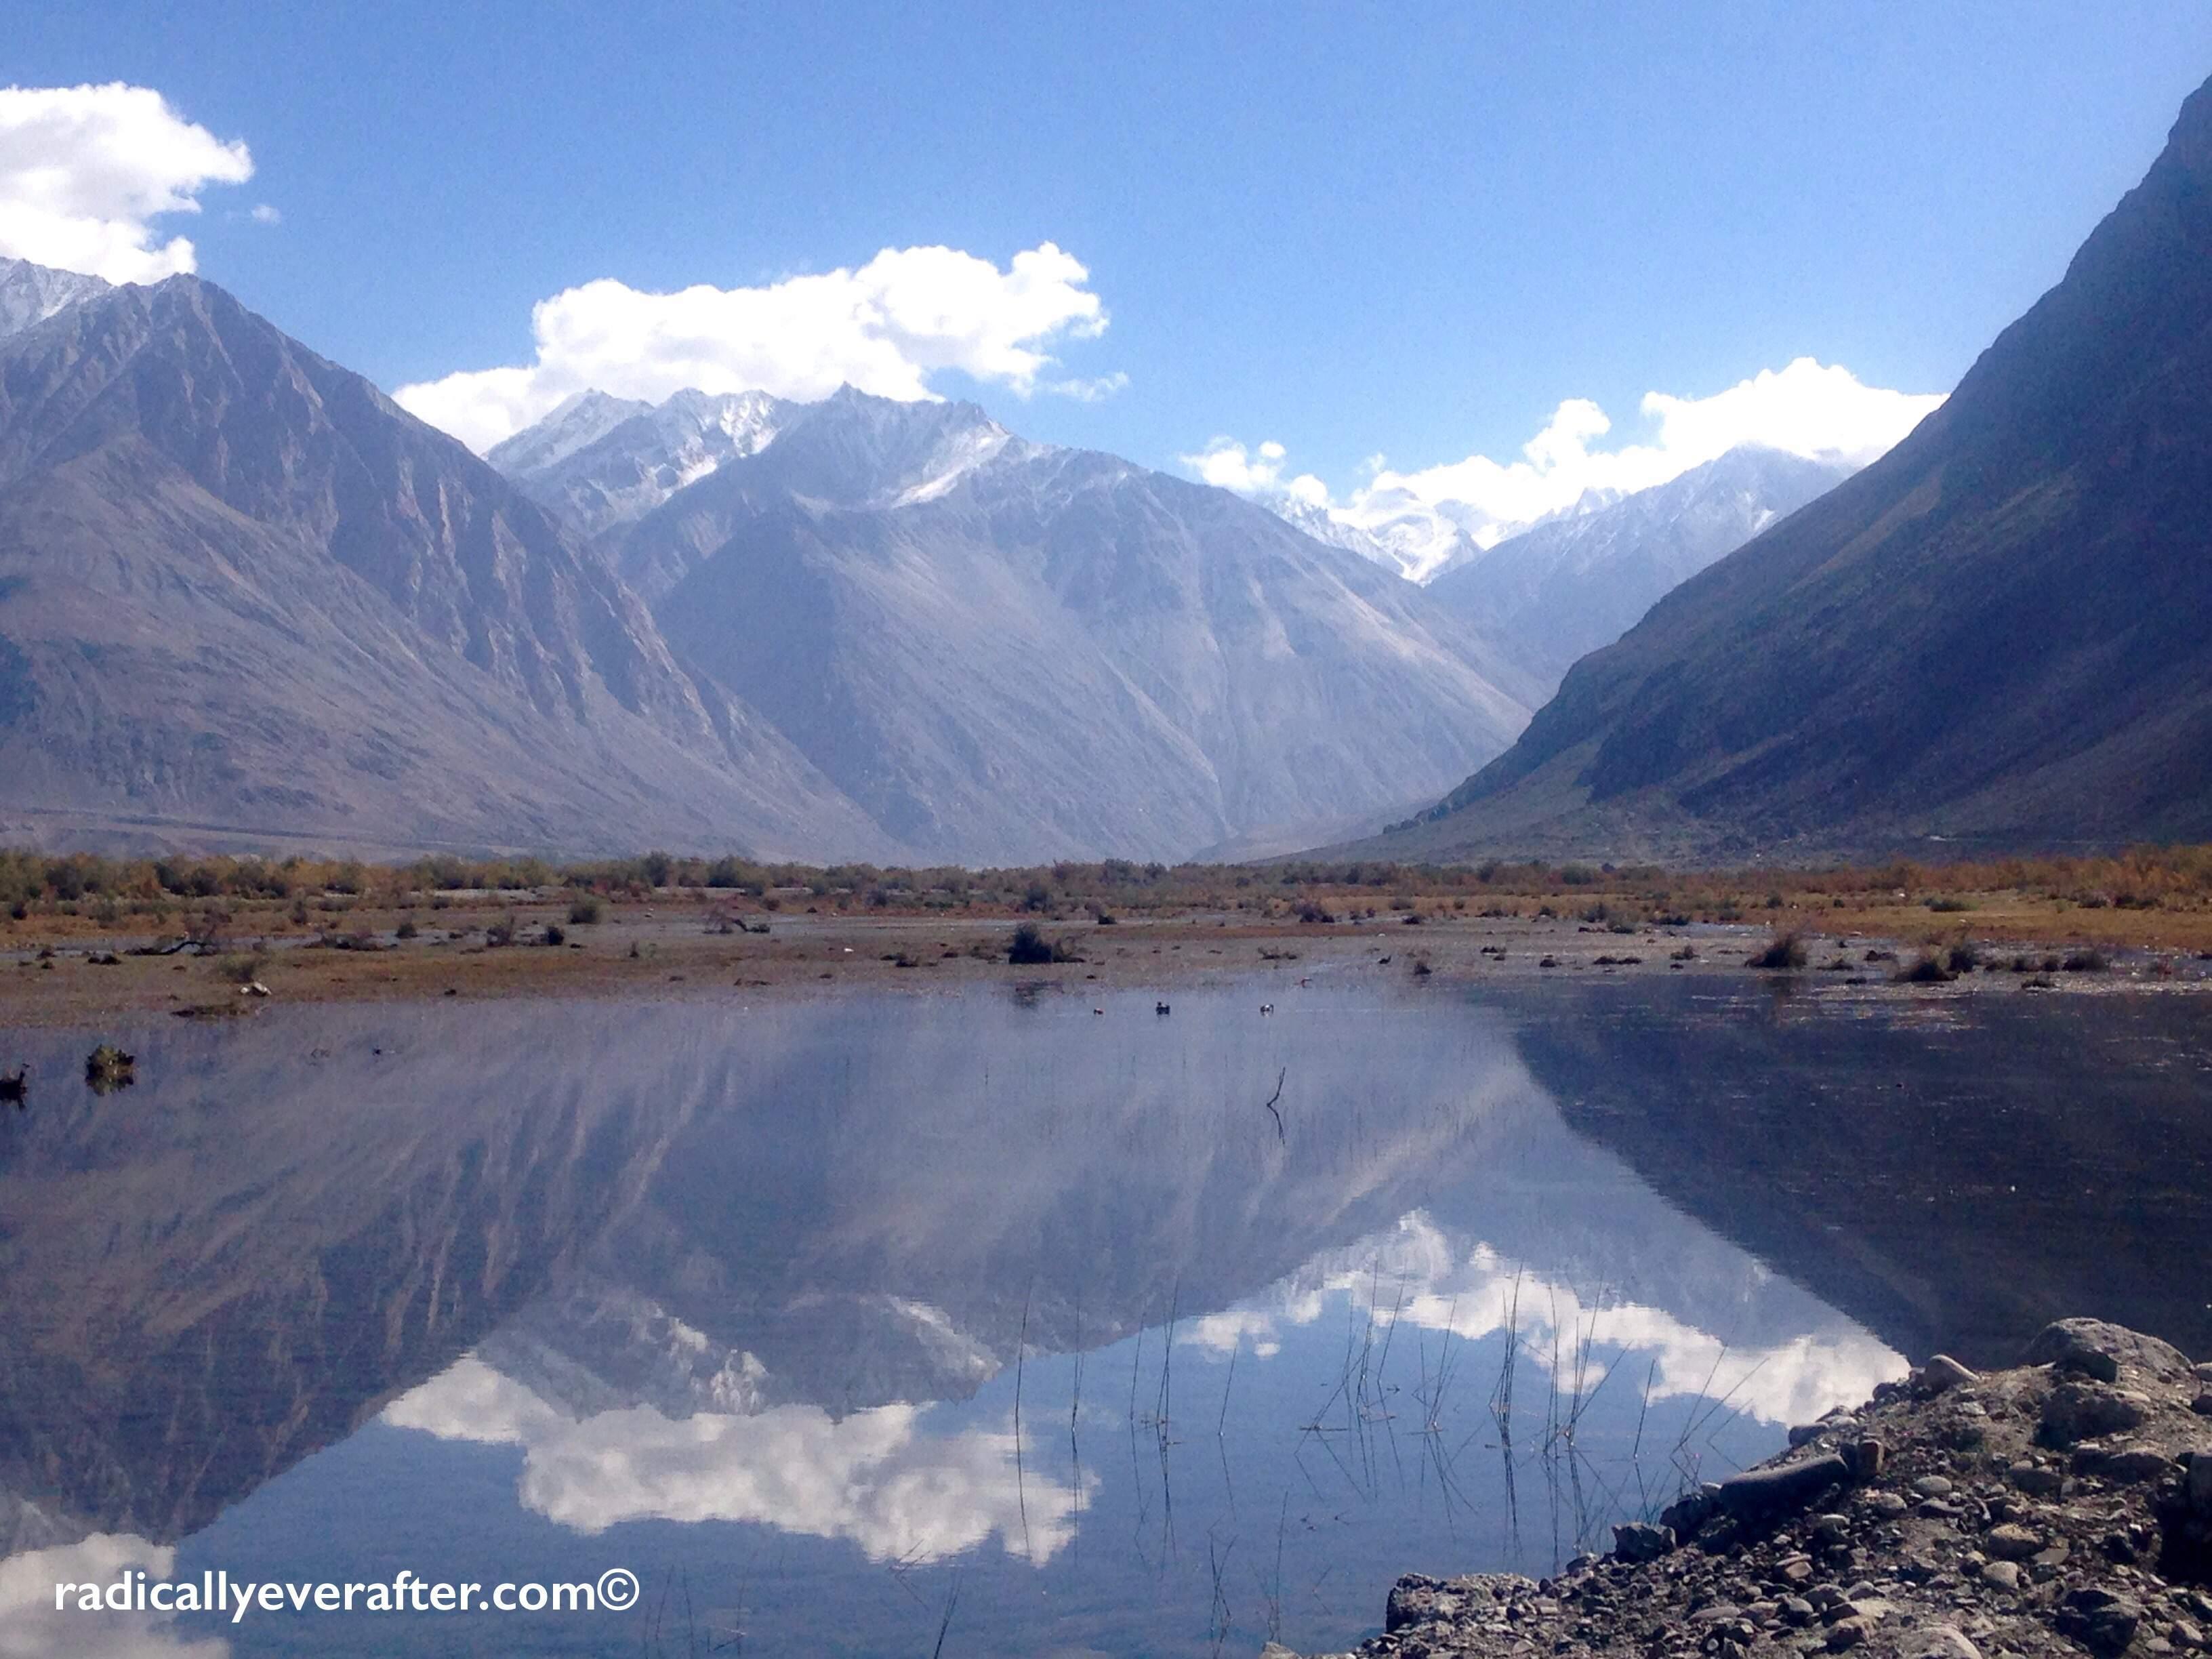 Ladakh, Nubra Valley, Lake, Reflection, BLue, Himalayas